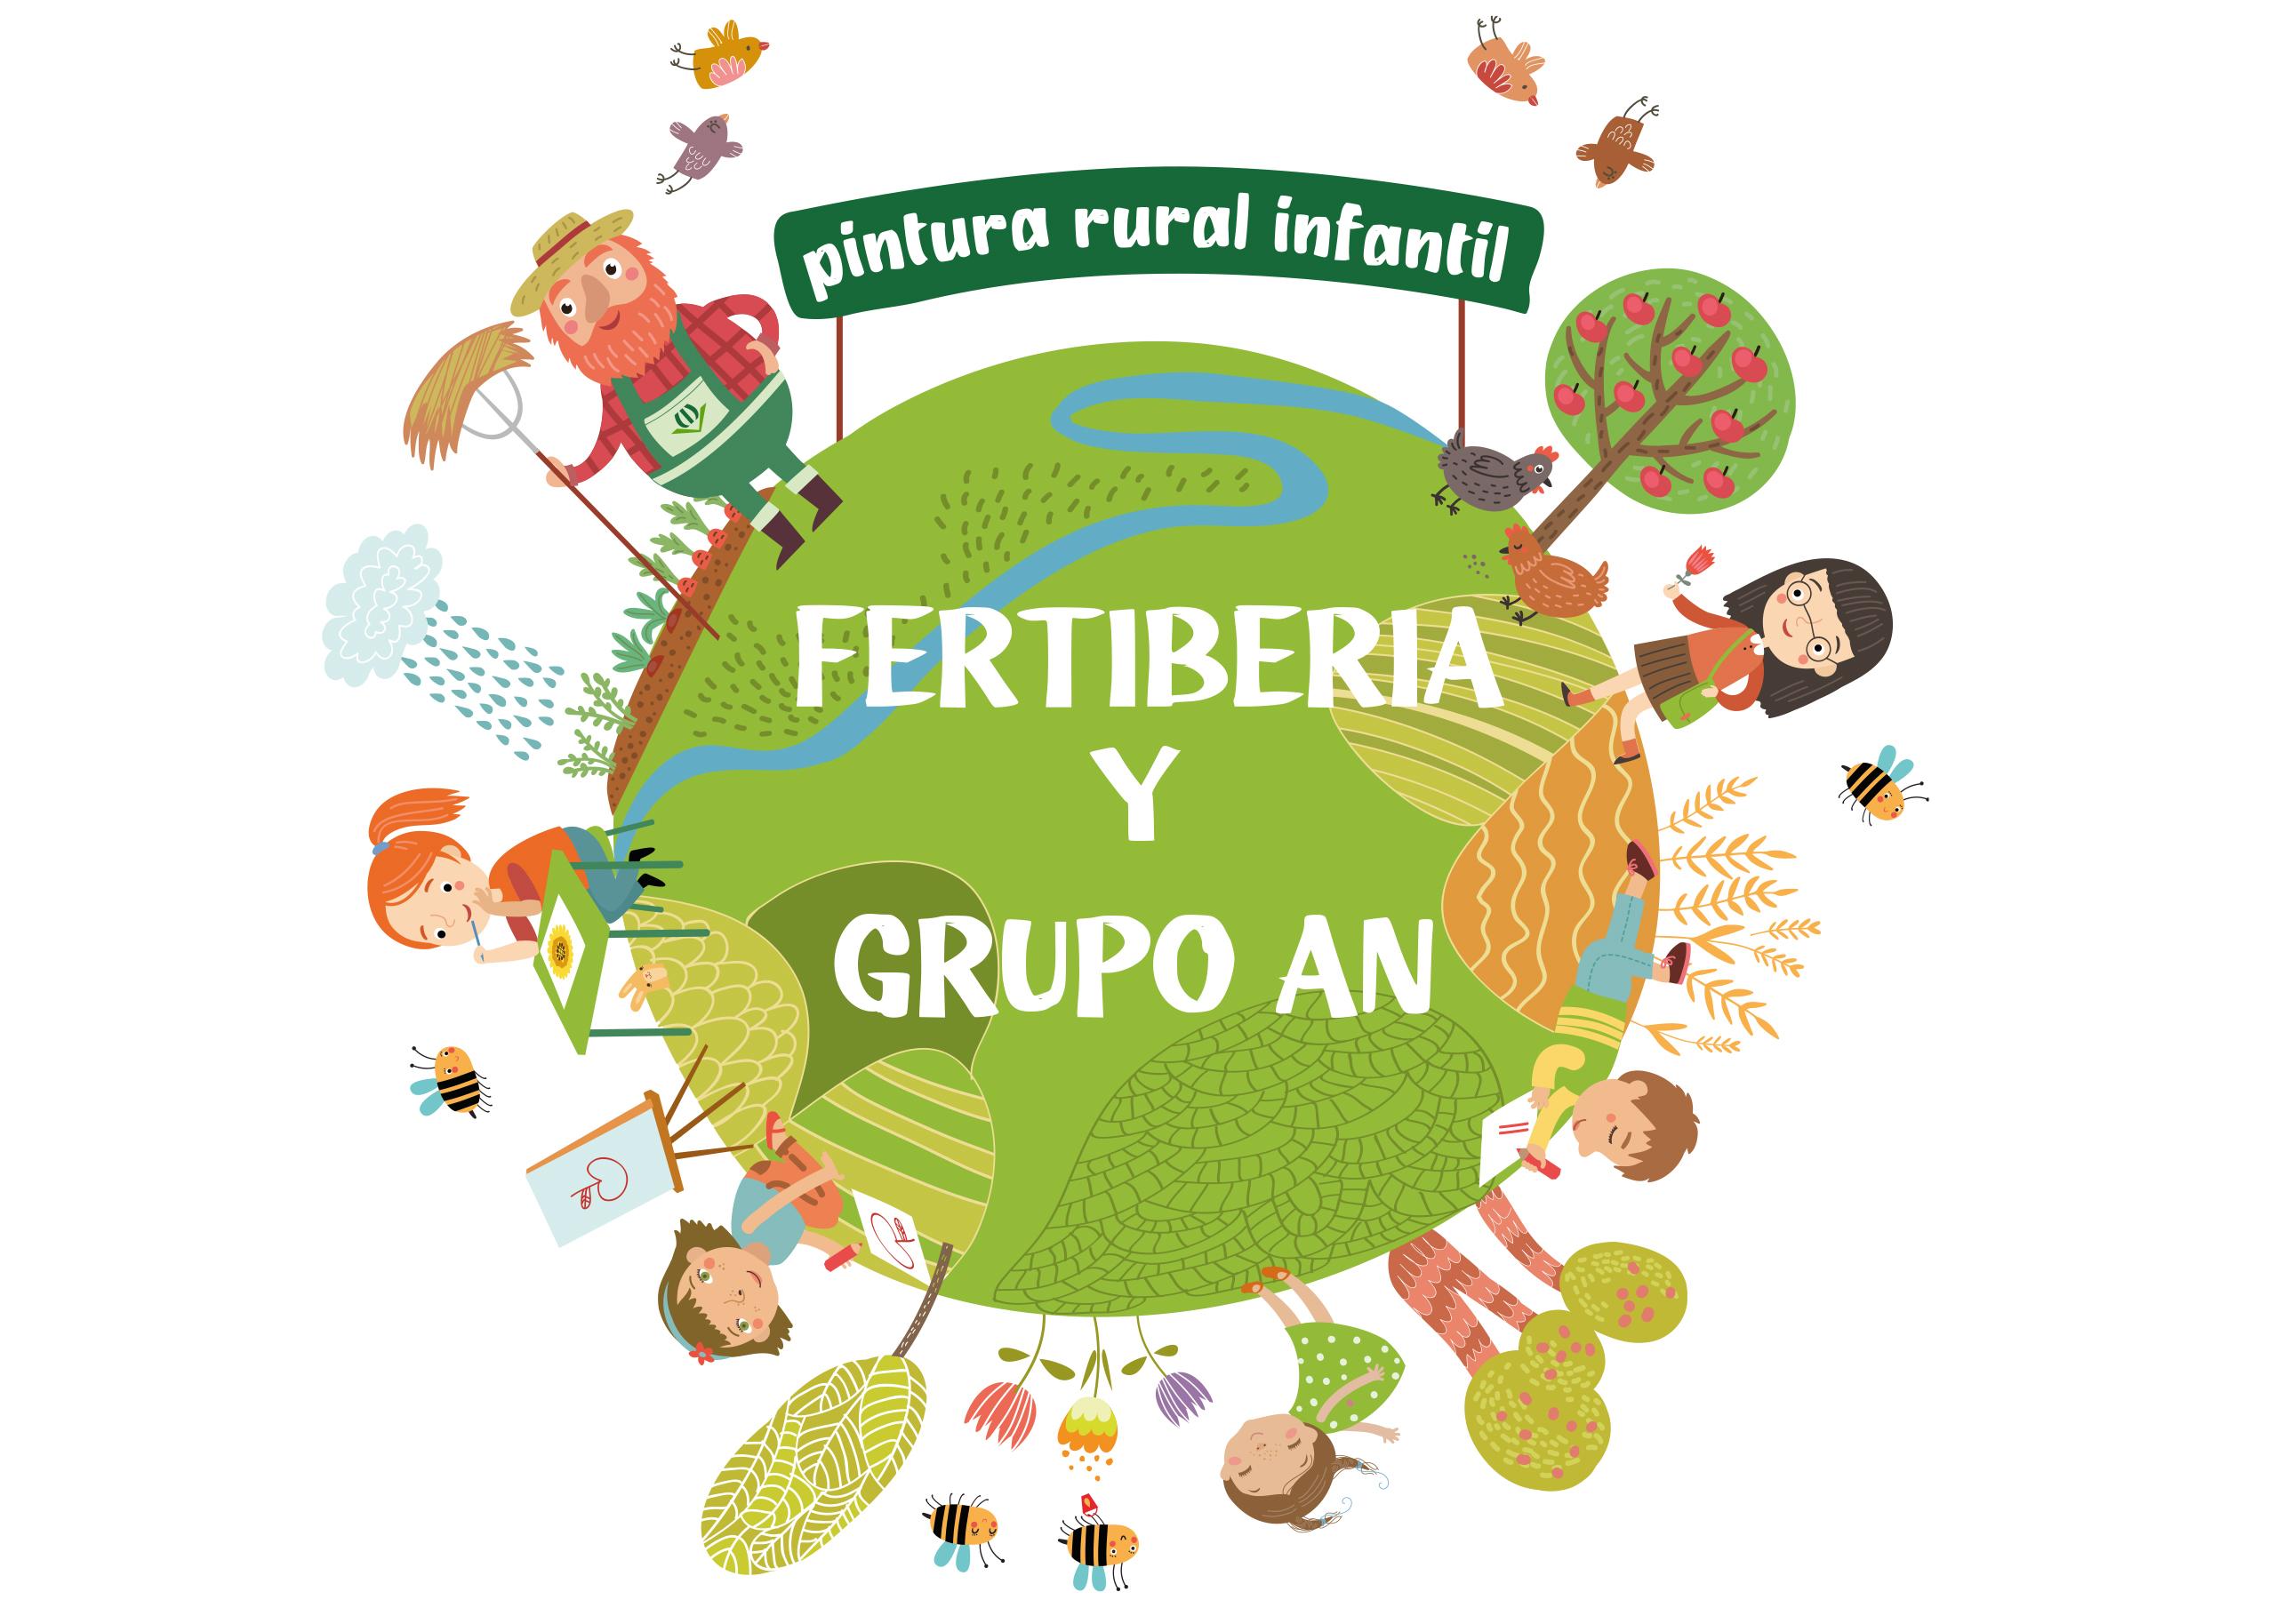 Cartel del Doble concurso pintura rural infantil Fertiberia y Grupo AN